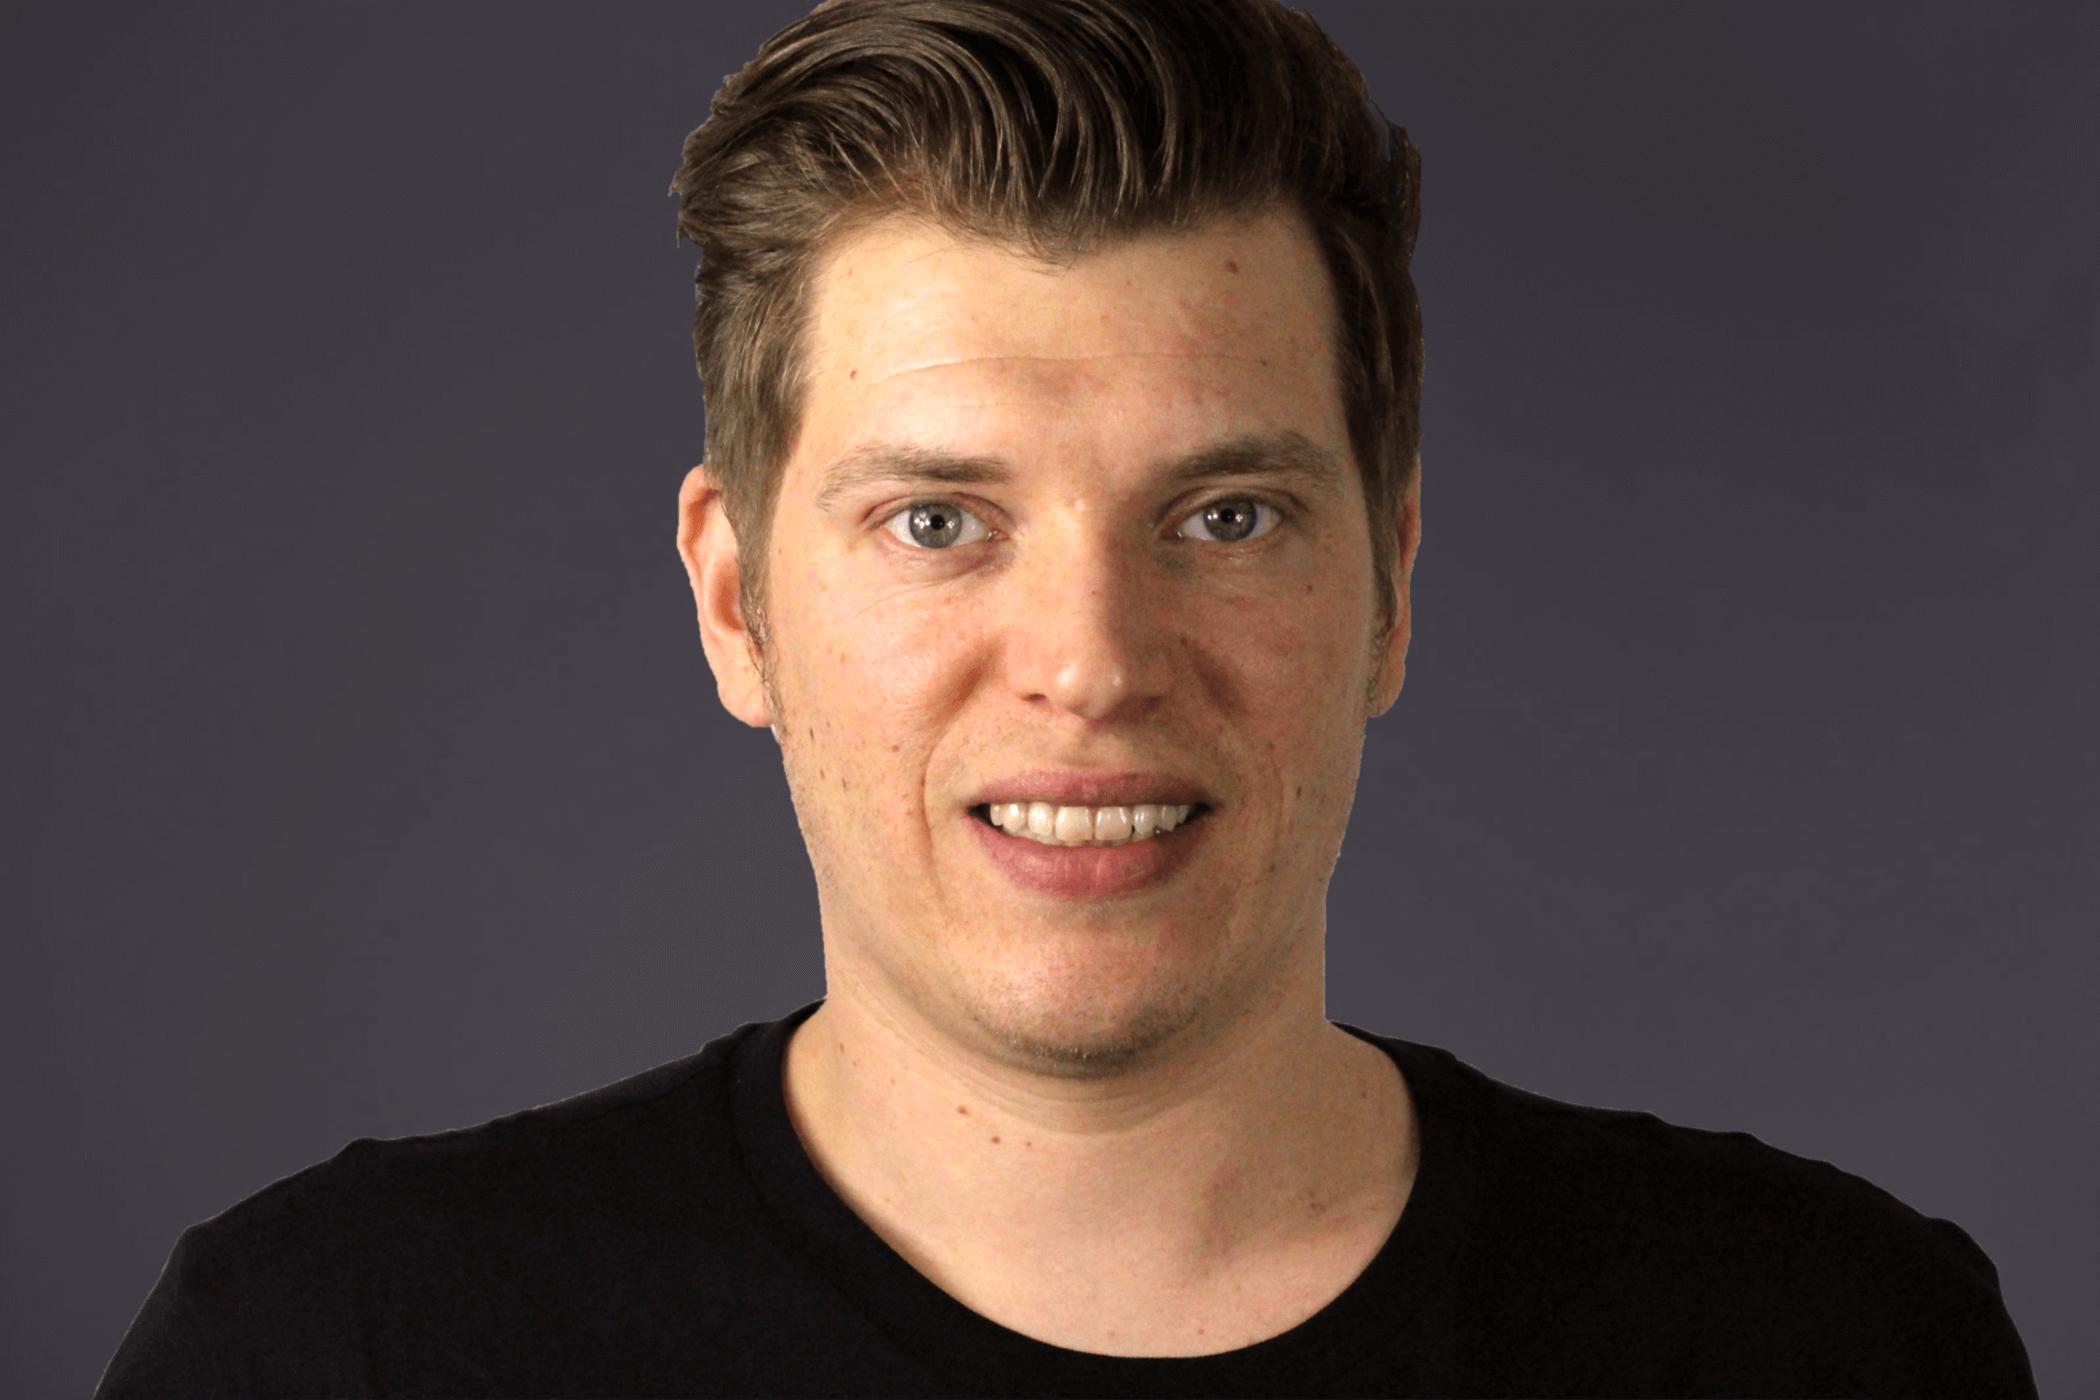 Andre Winterberg